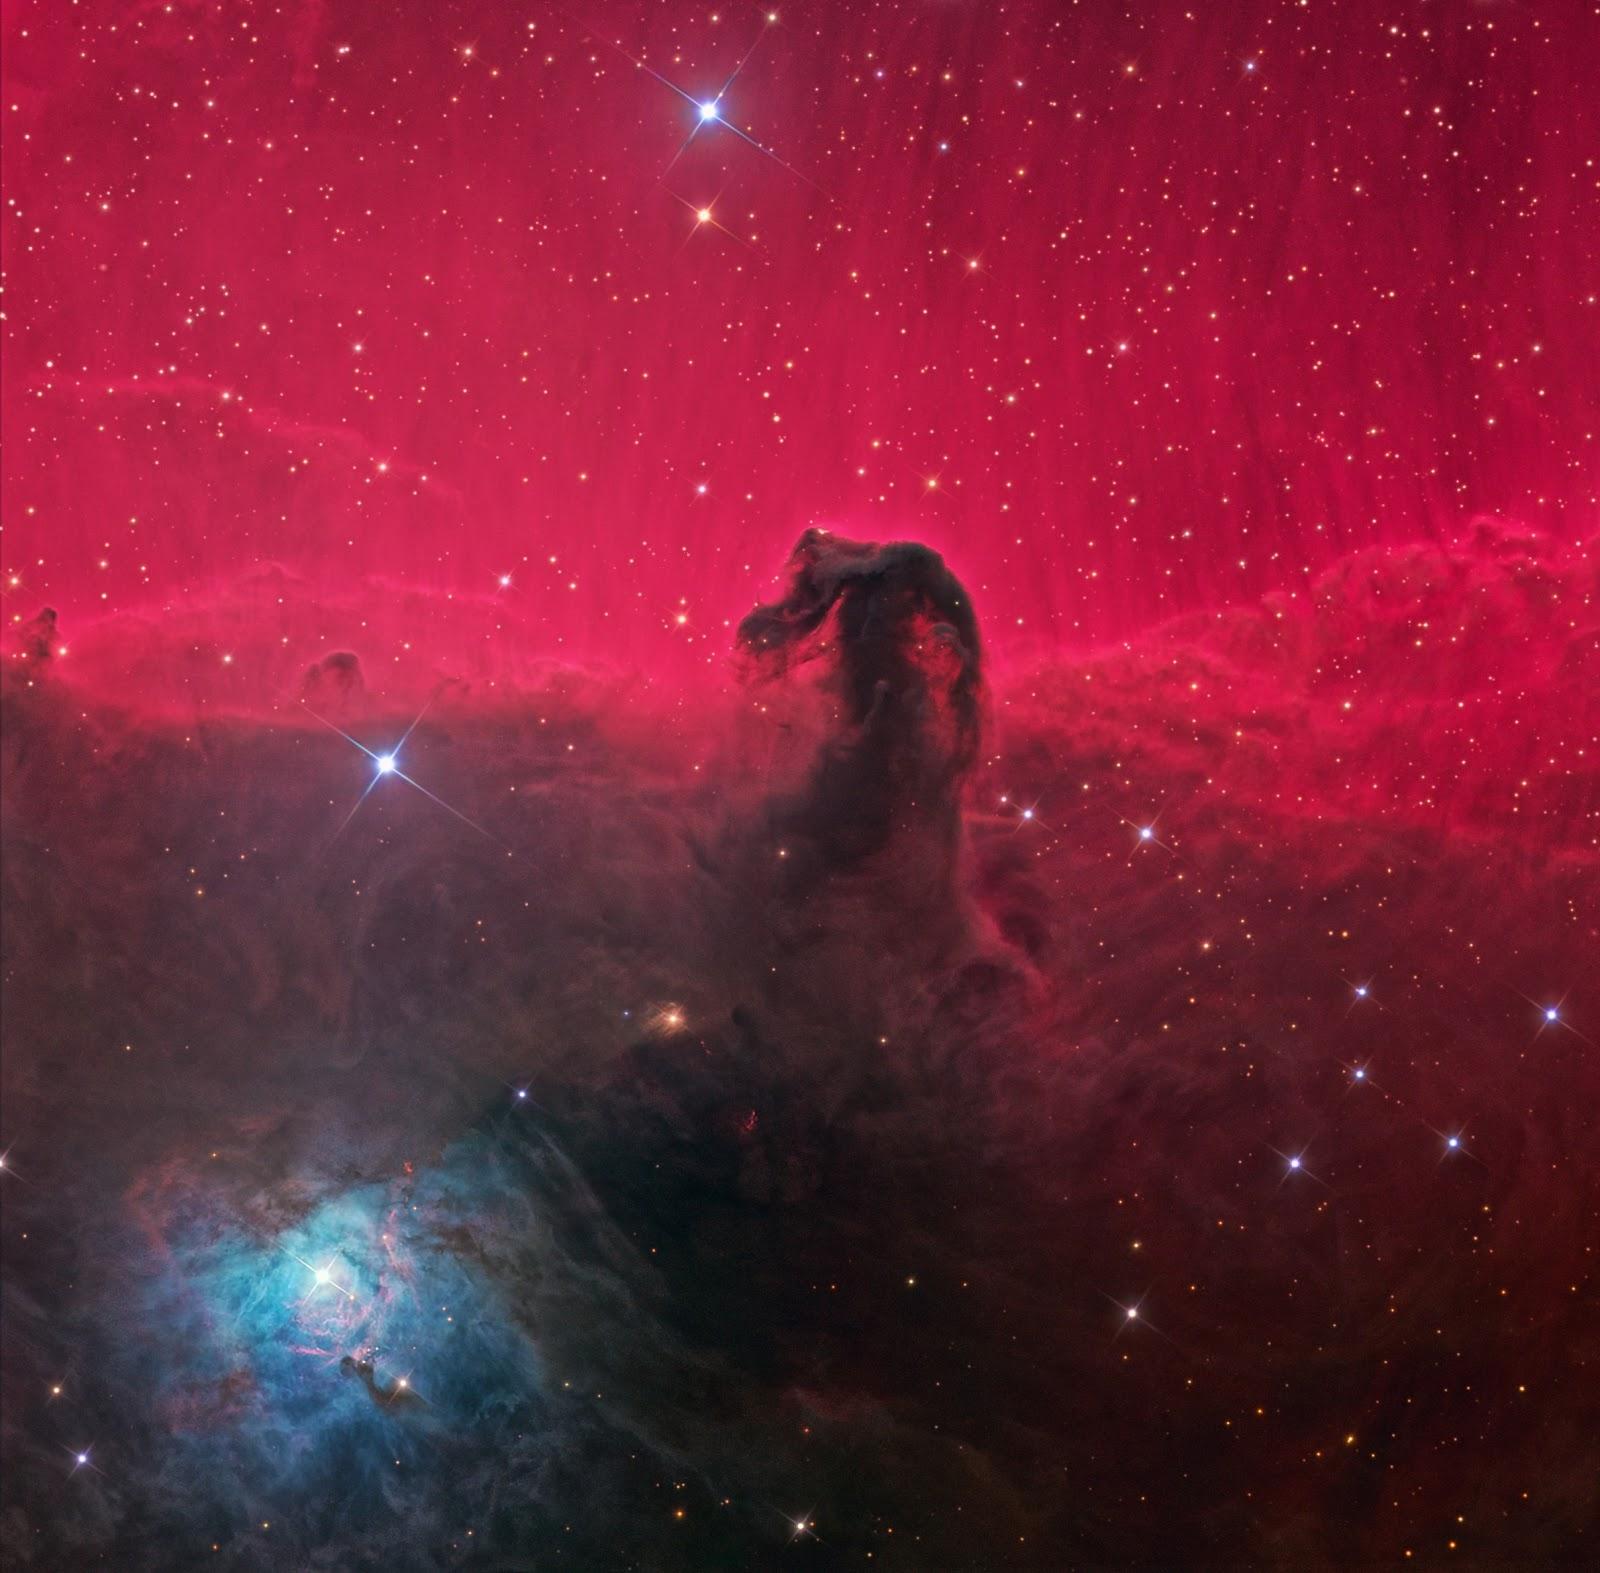 Good   Wallpaper Horse Nebula - Horsehead-Nebula-Wallpaper-HD-06  You Should Have_152118.jpg